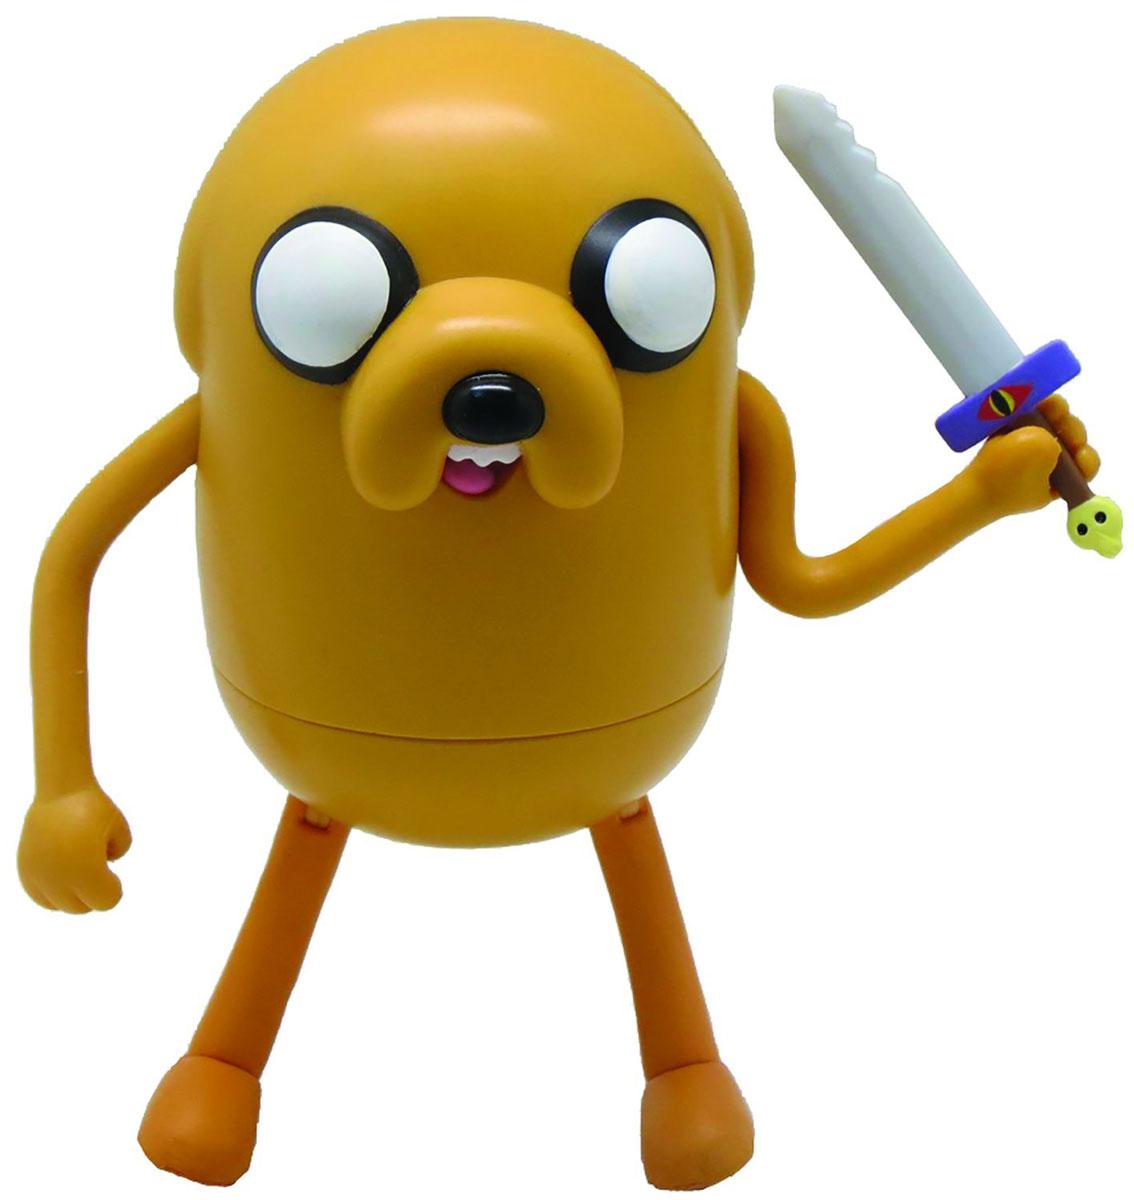 Adventure Time Фигурка Jake with Sword фигурки adventure time jake